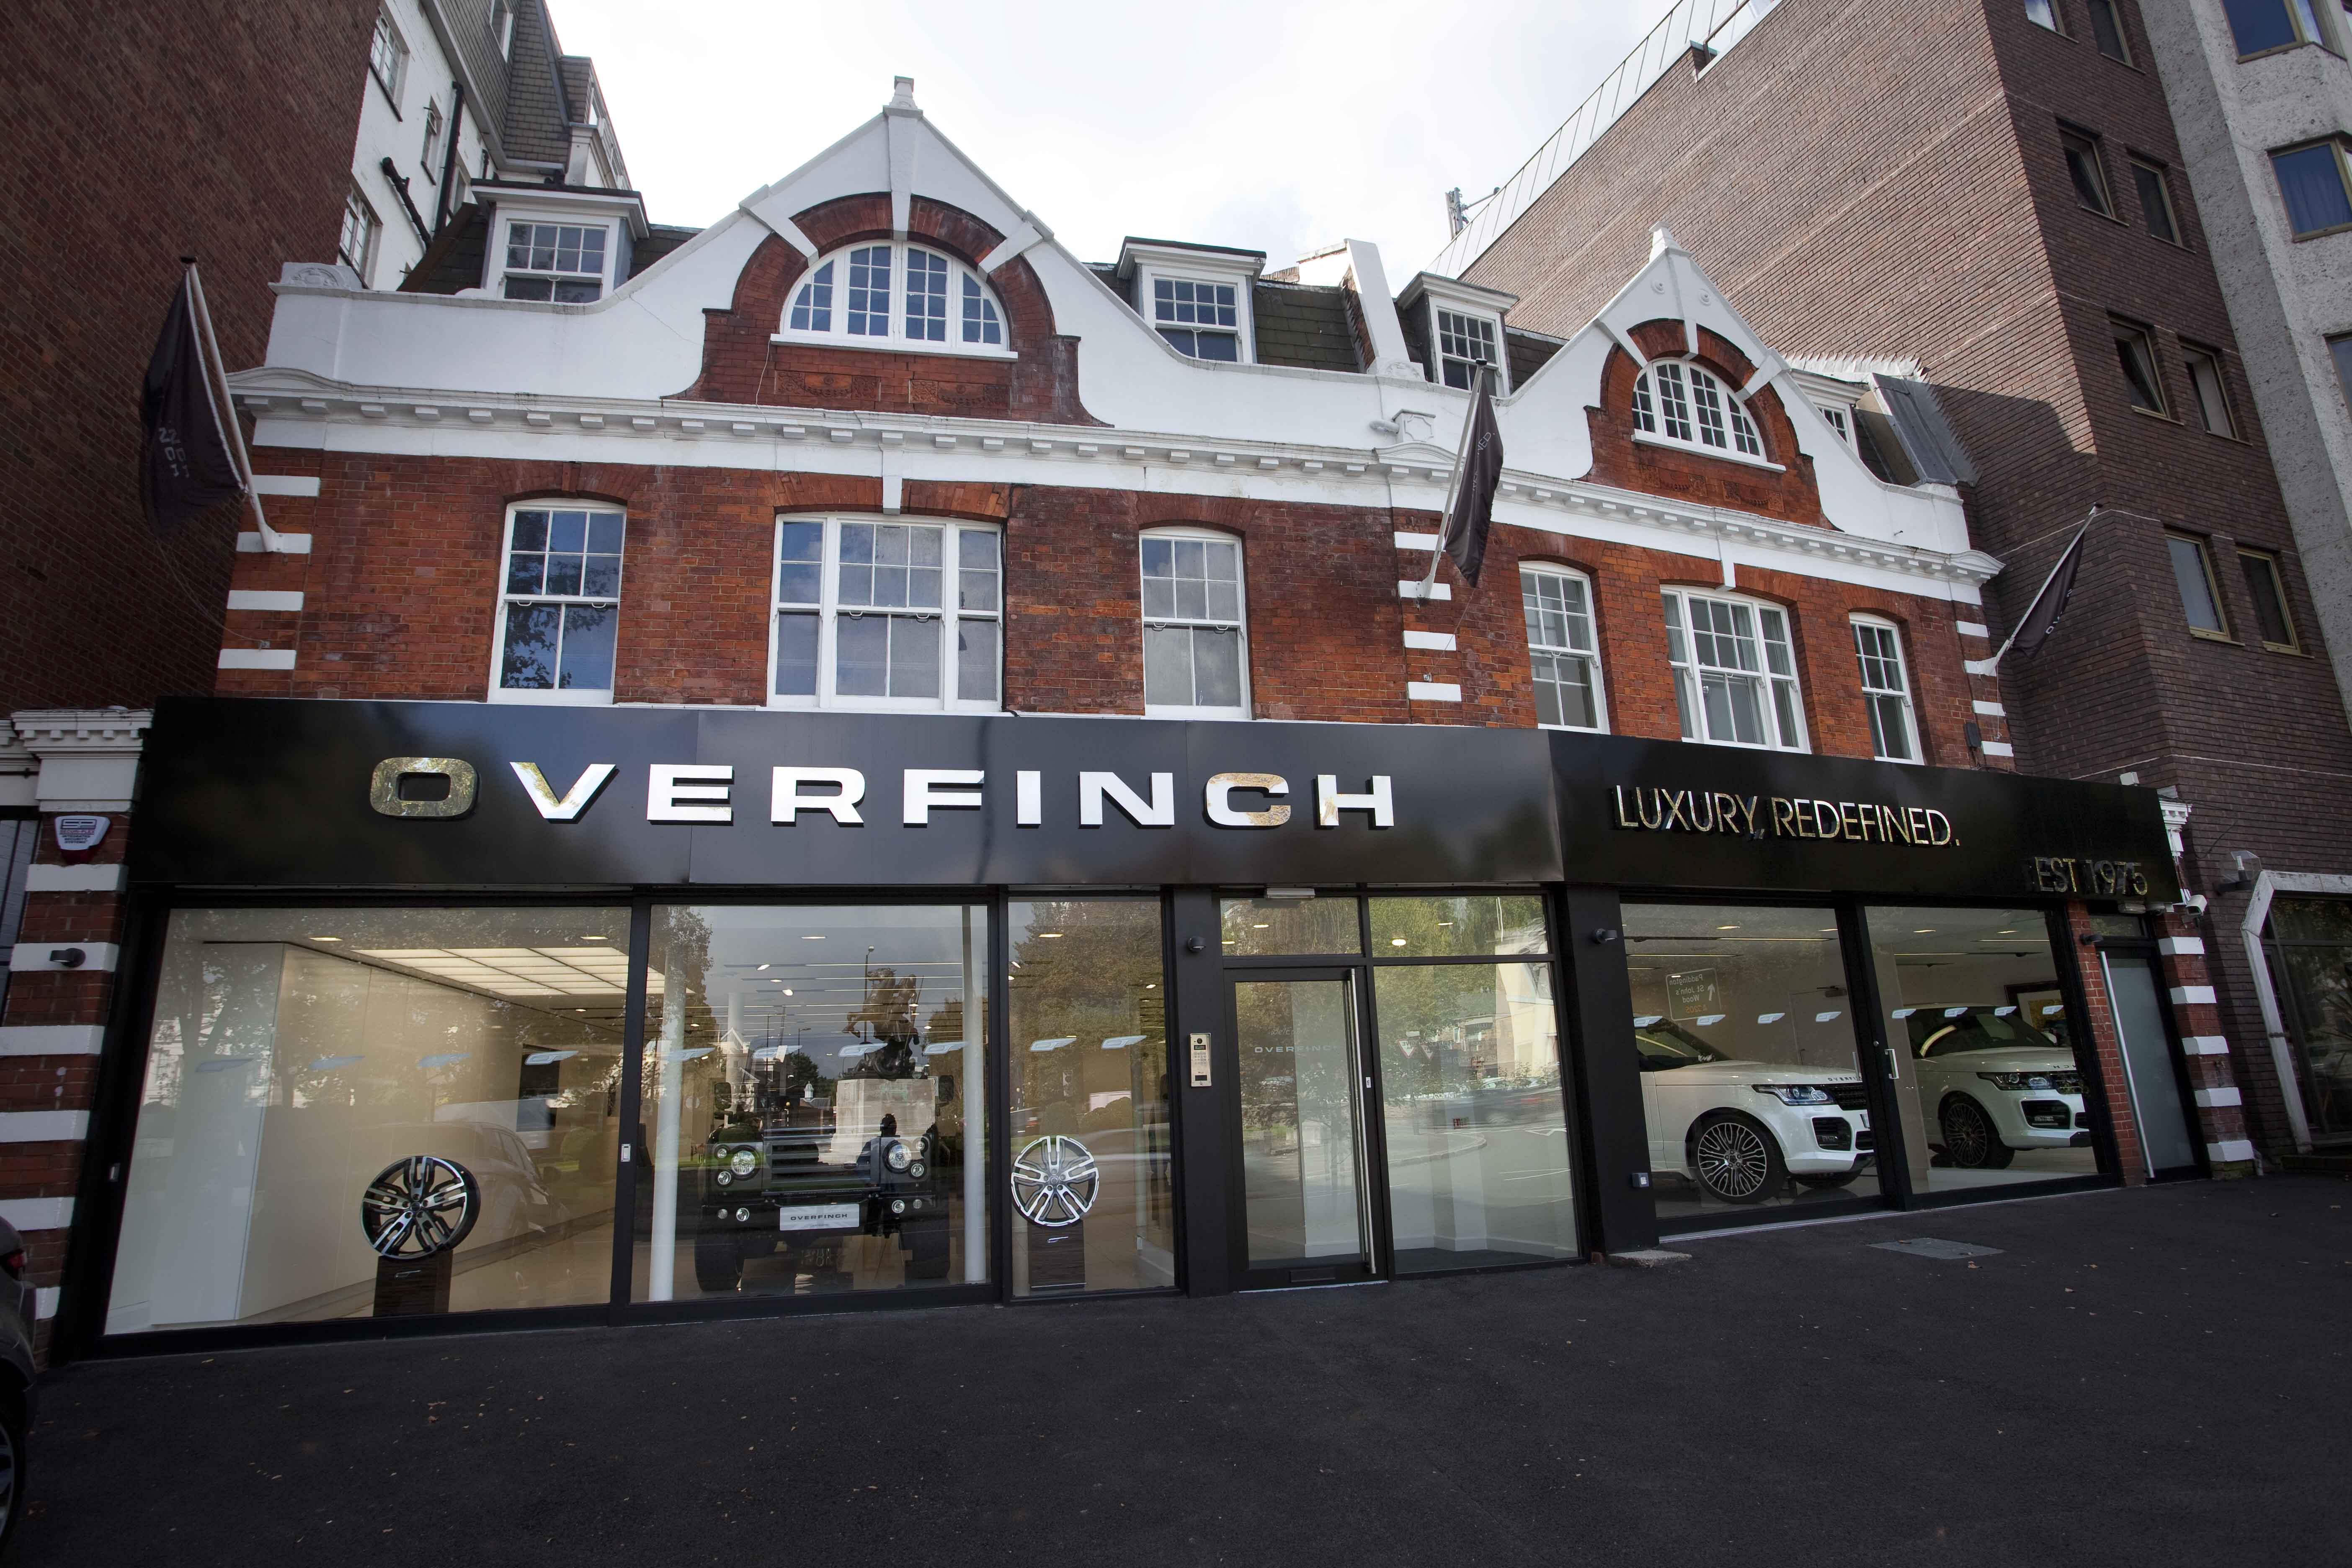 Overfinch Landrover Office Furniture  31 Range Rover Showroom London   Richardsons Office Furniture and  . Office Furniture Showroom Central London. Home Design Ideas